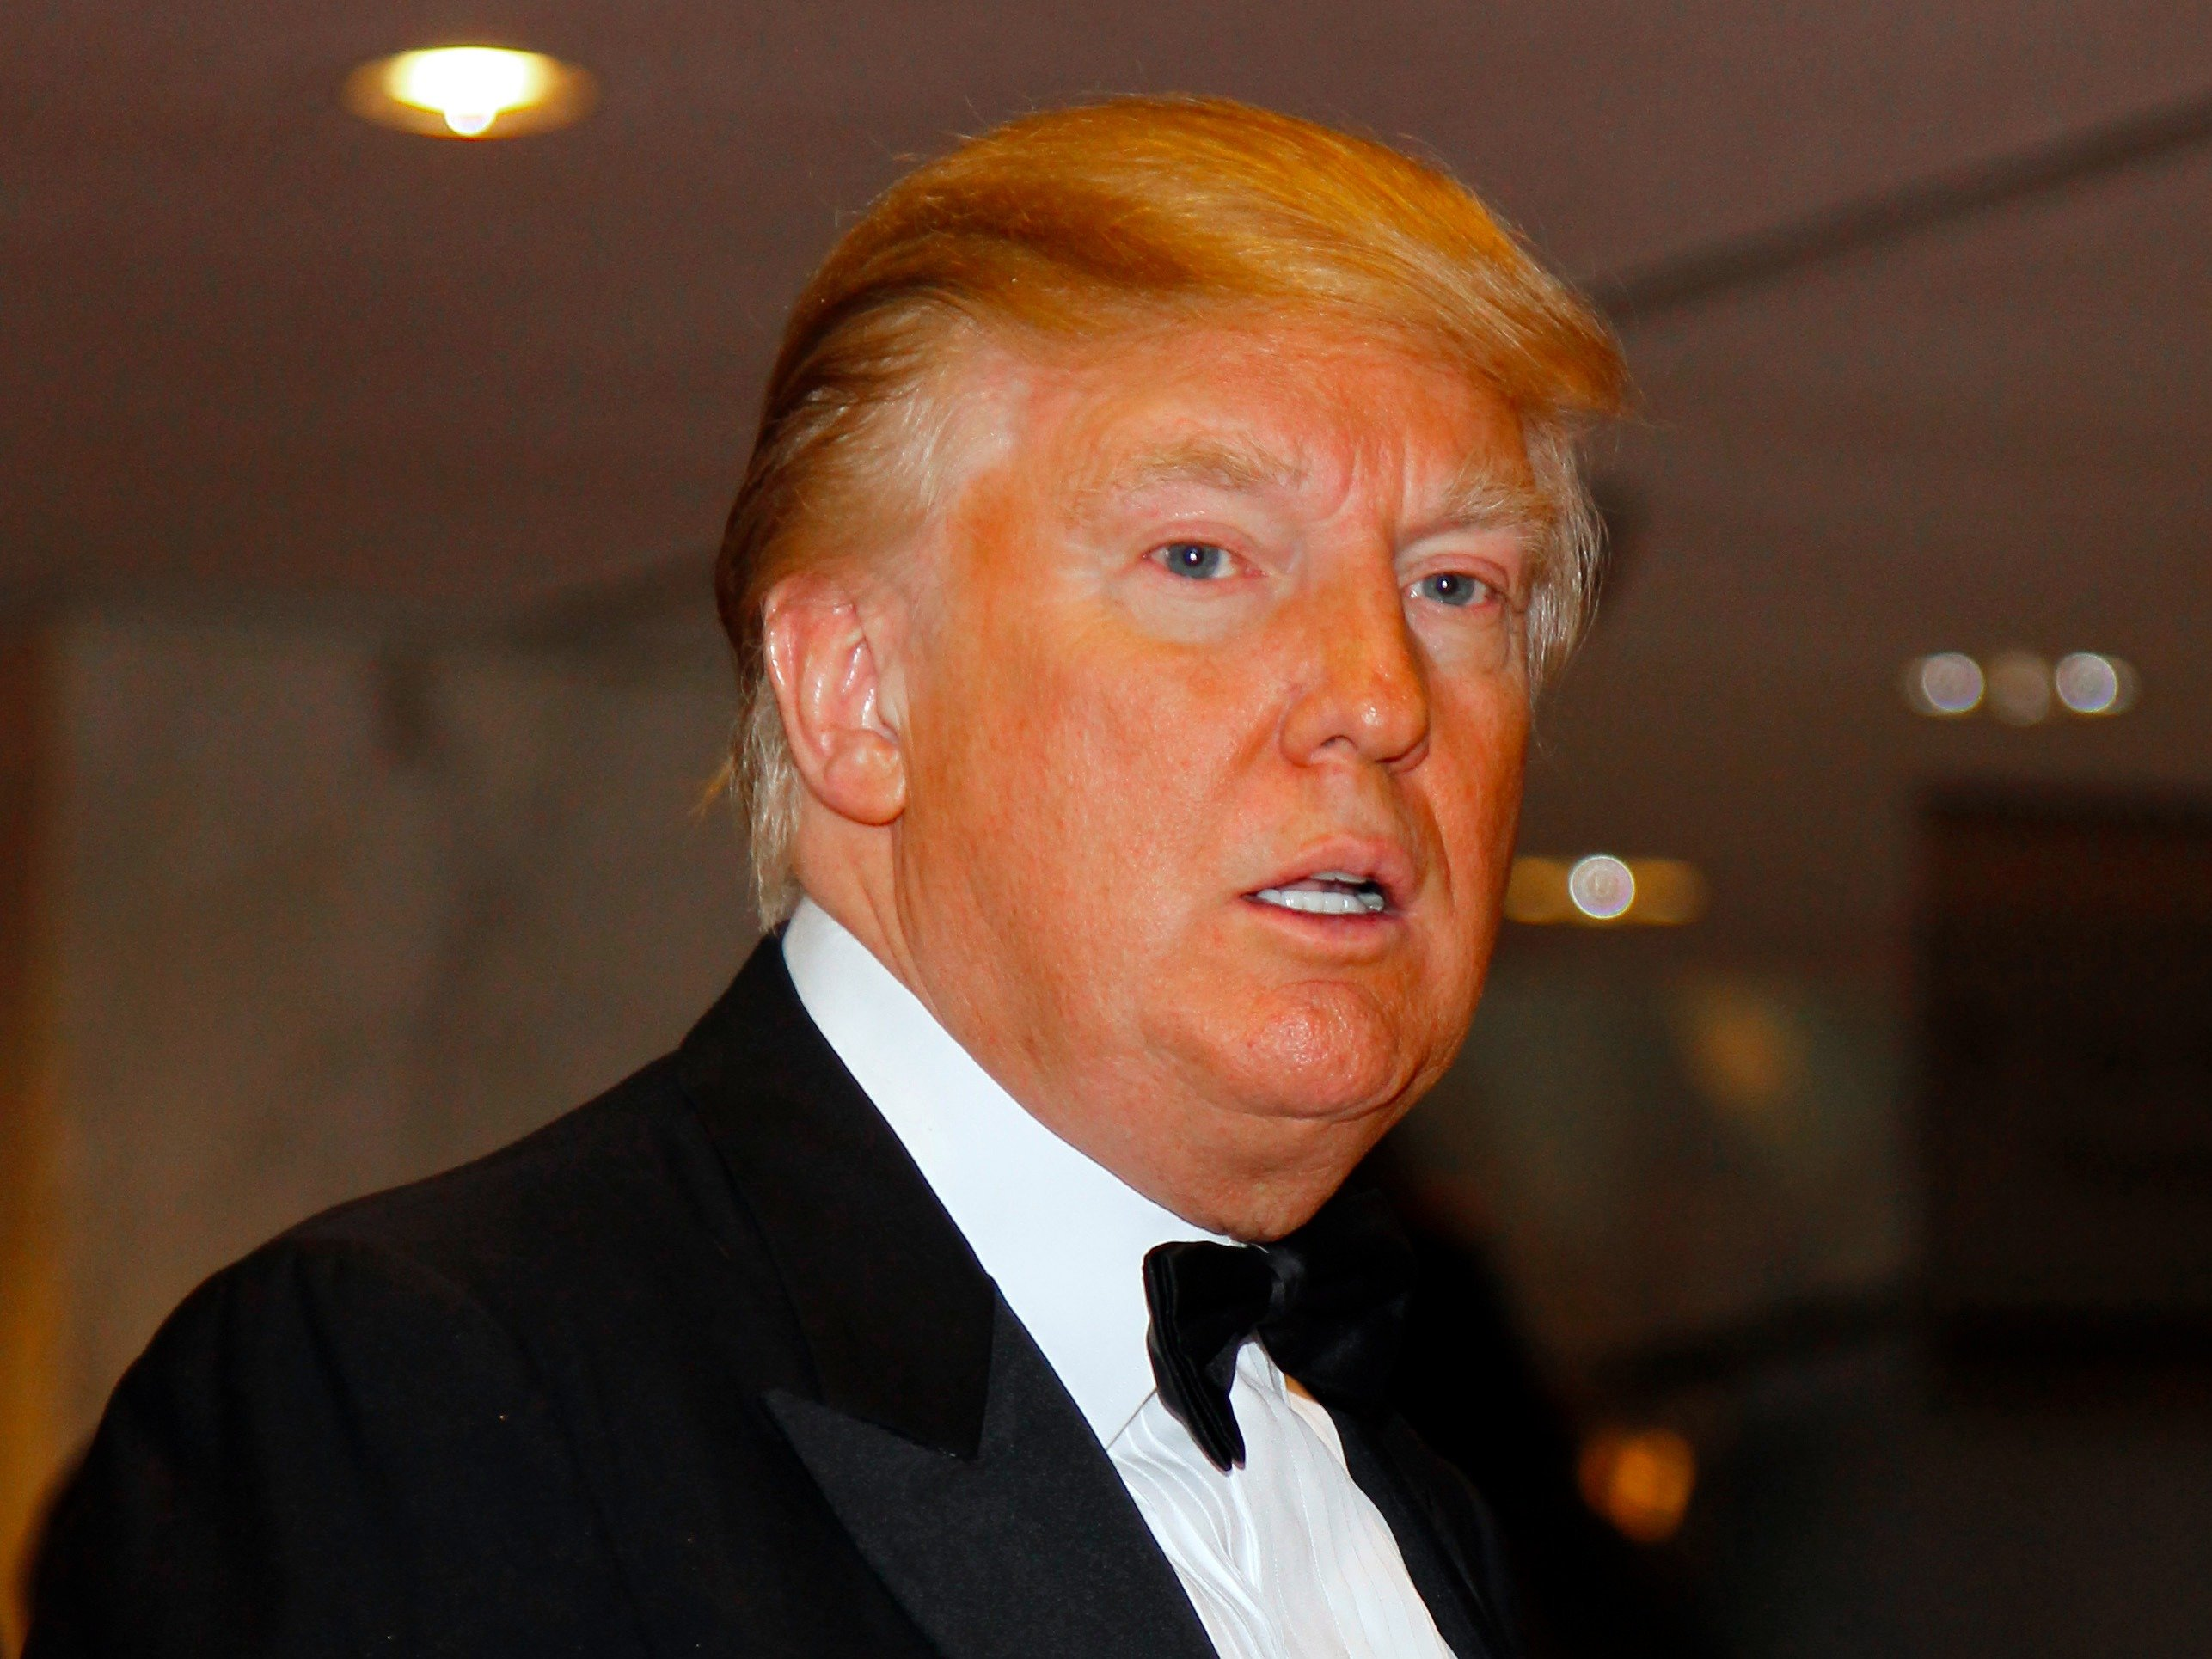 donald_trump_orange_is_the_new_black